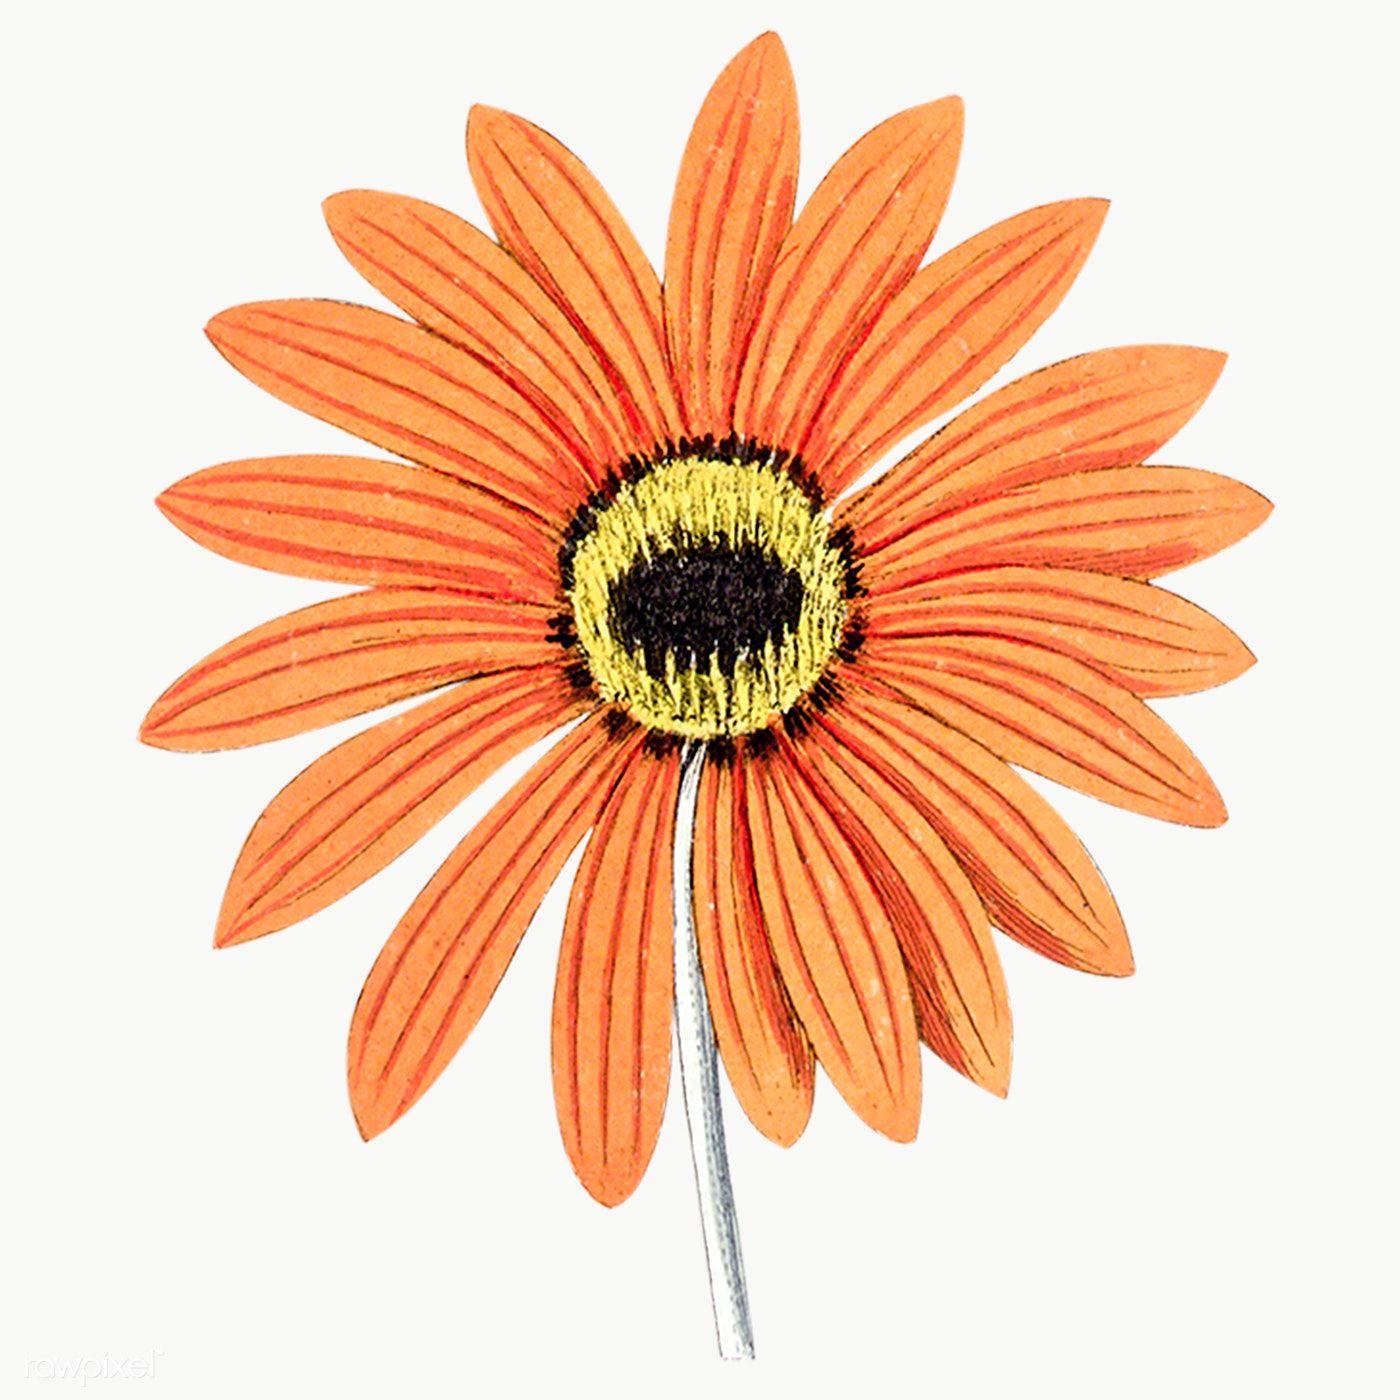 Orange Flower Png Image Clipart Flower Png Images Flower Silhouette Orange Flowers